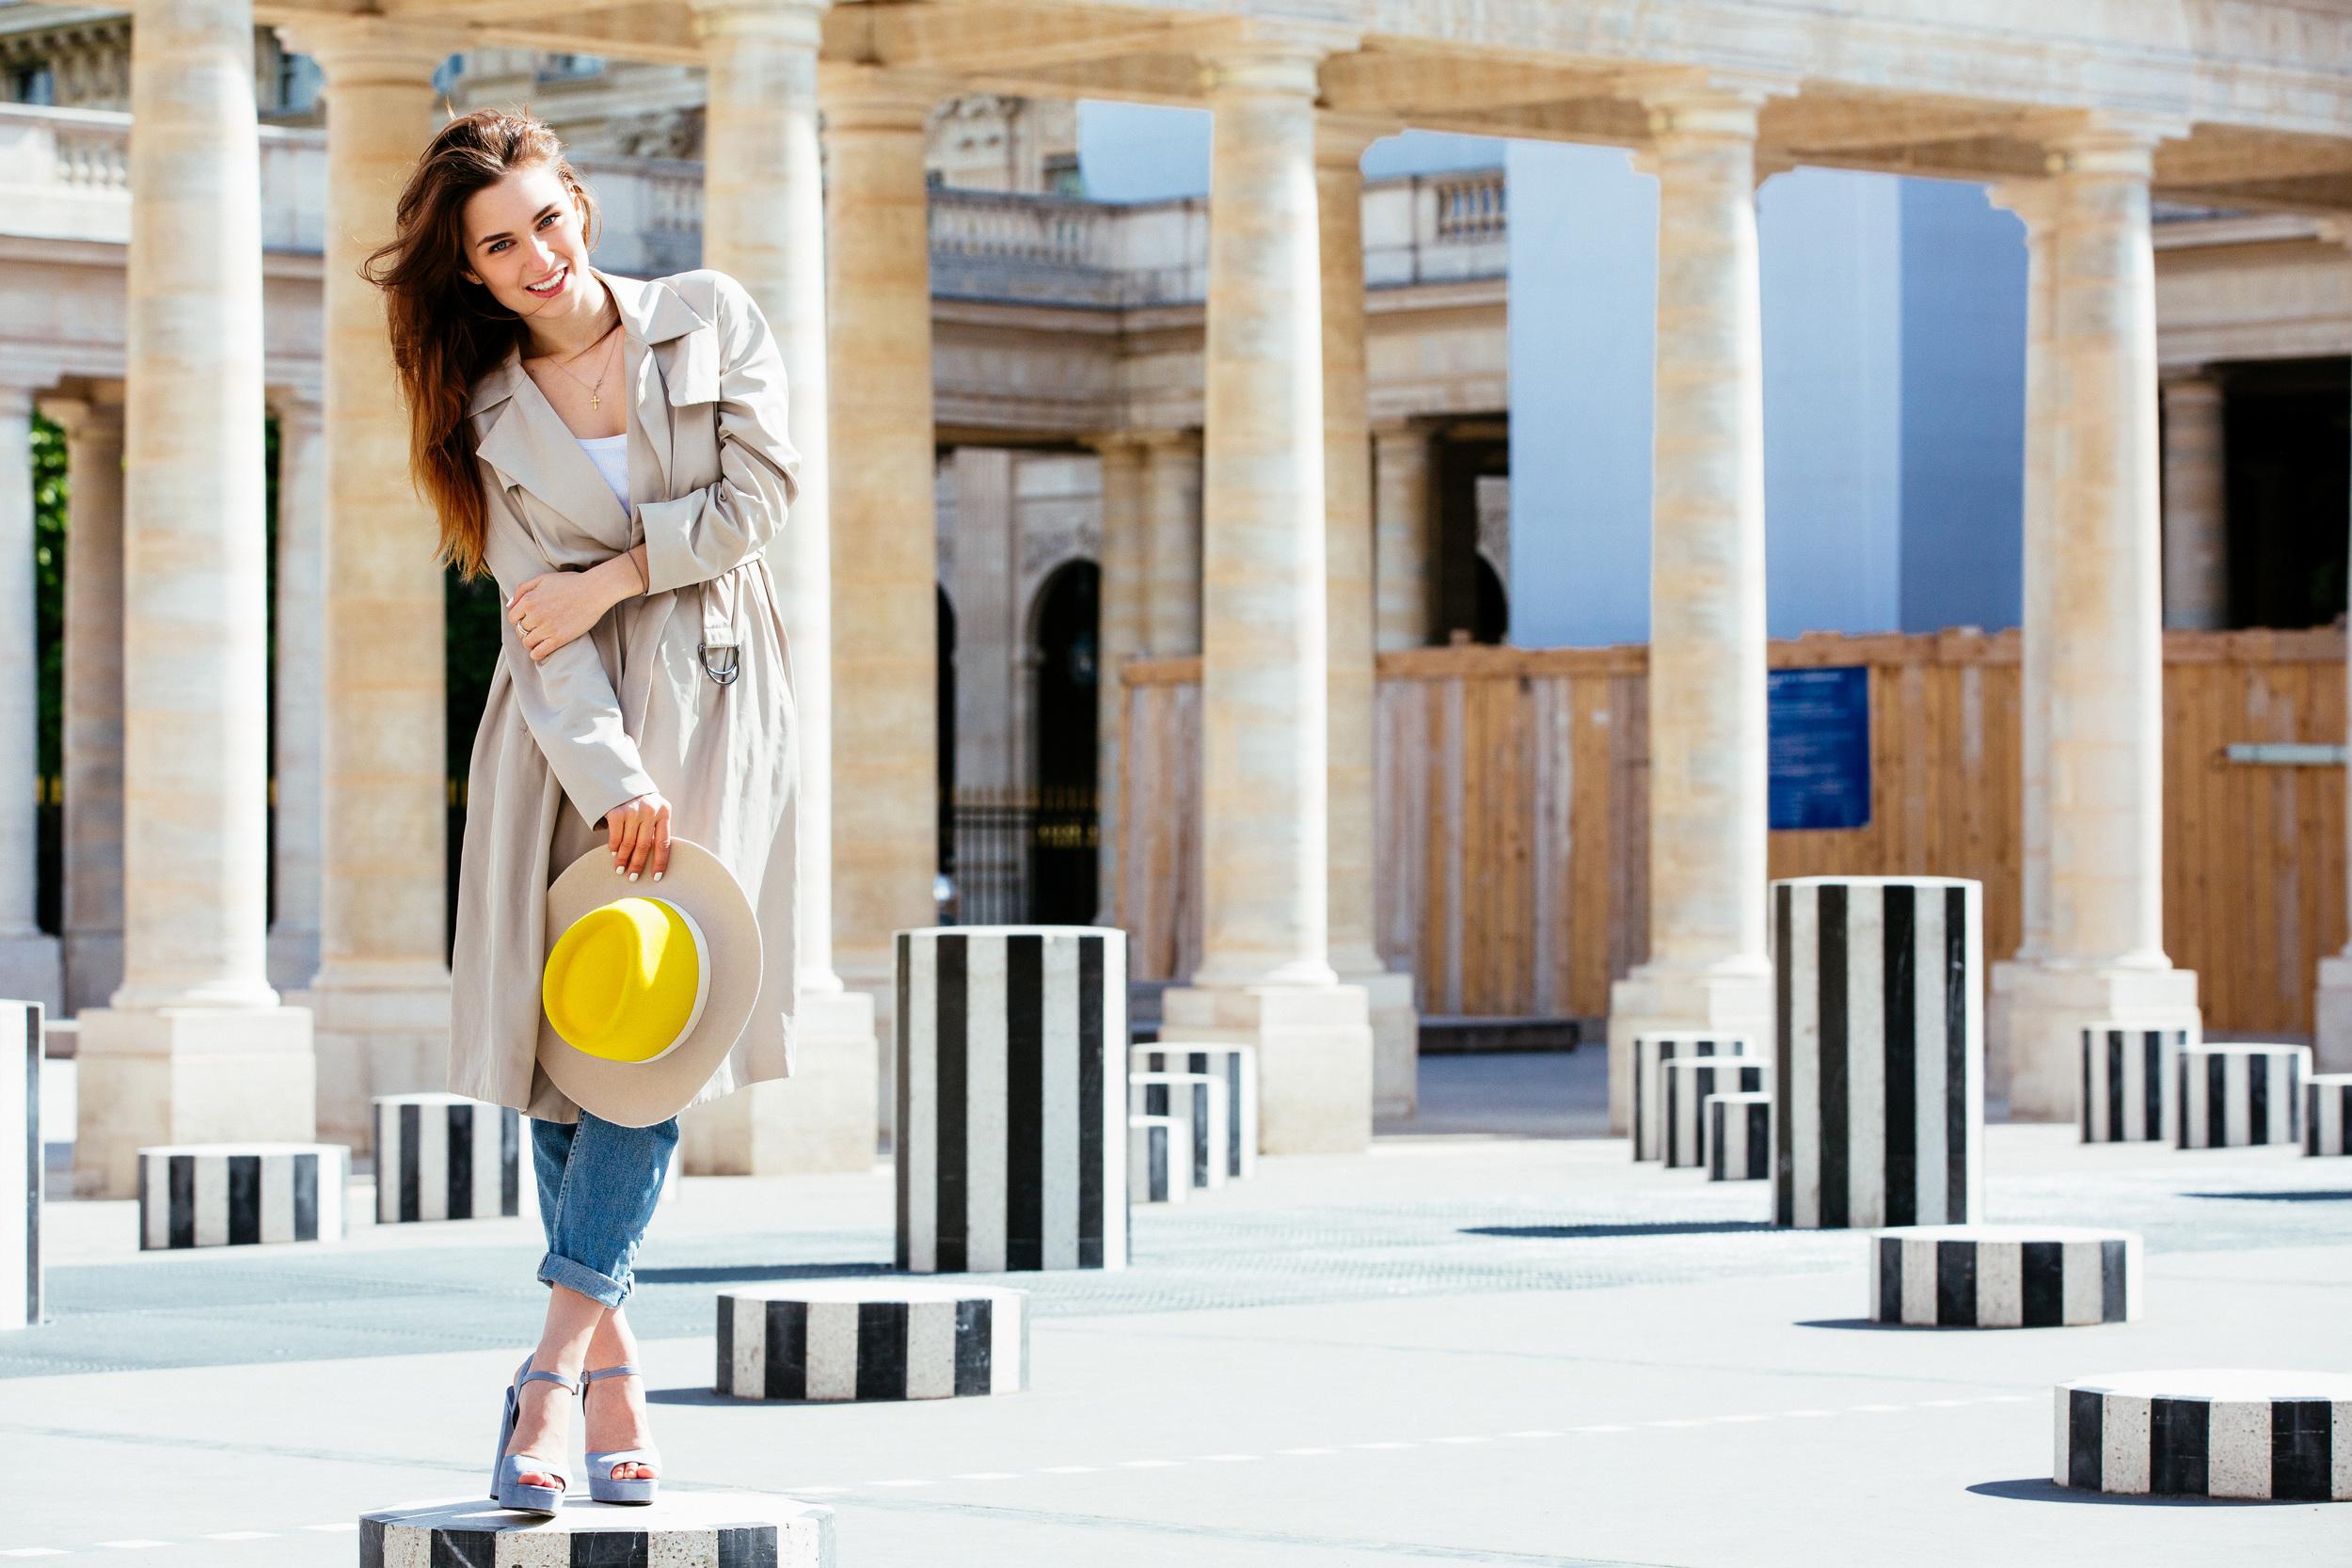 Photographer in Paris, Palais Royal, Brand, Lookbook, Iheartparisfr